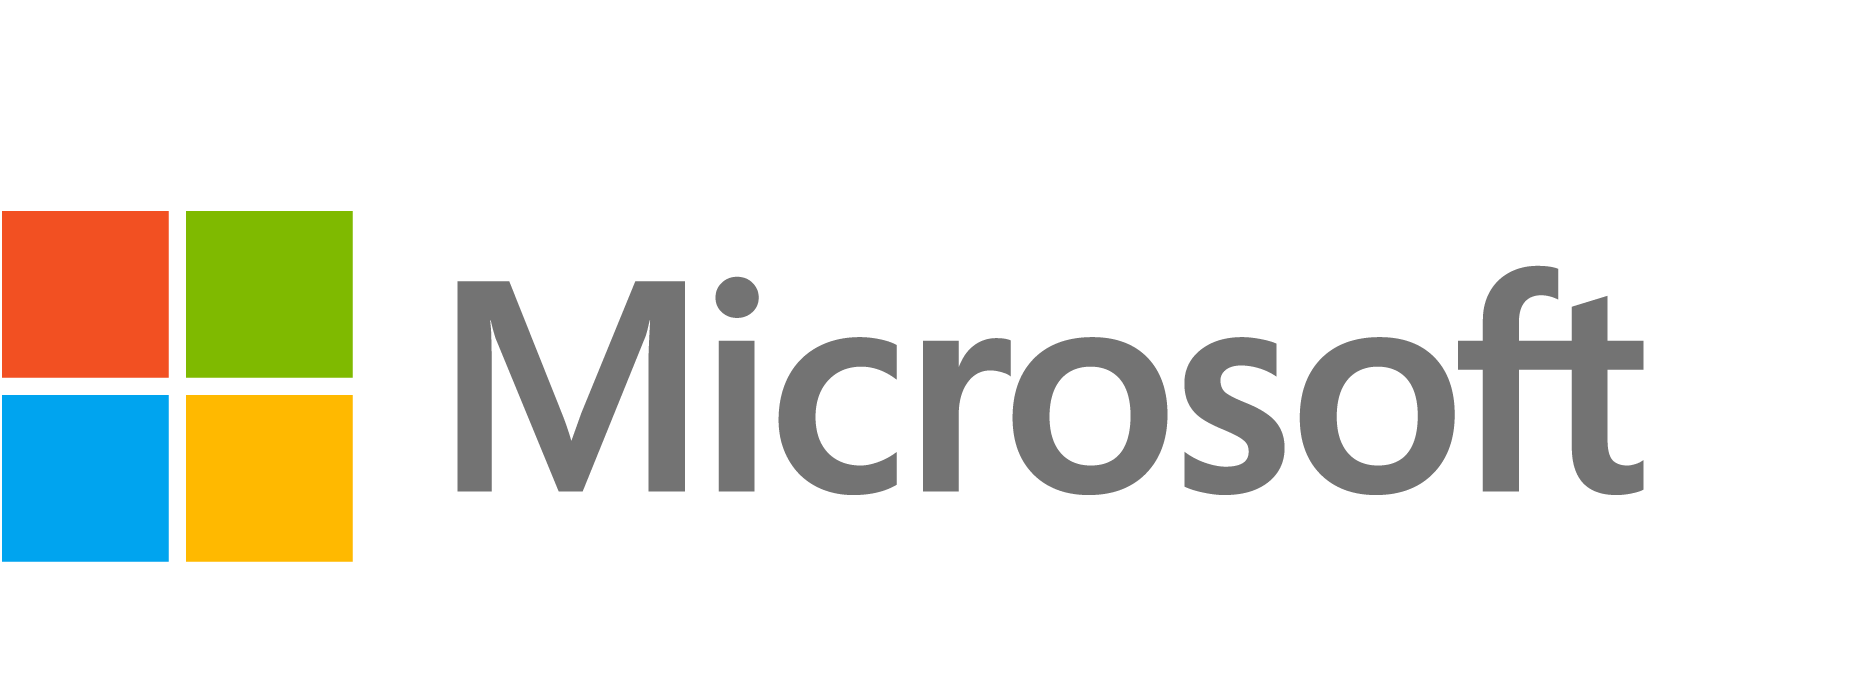 SQL Server Enterprise - 2 Core License Pack - 3 year (DG7GMGF0FKZV)